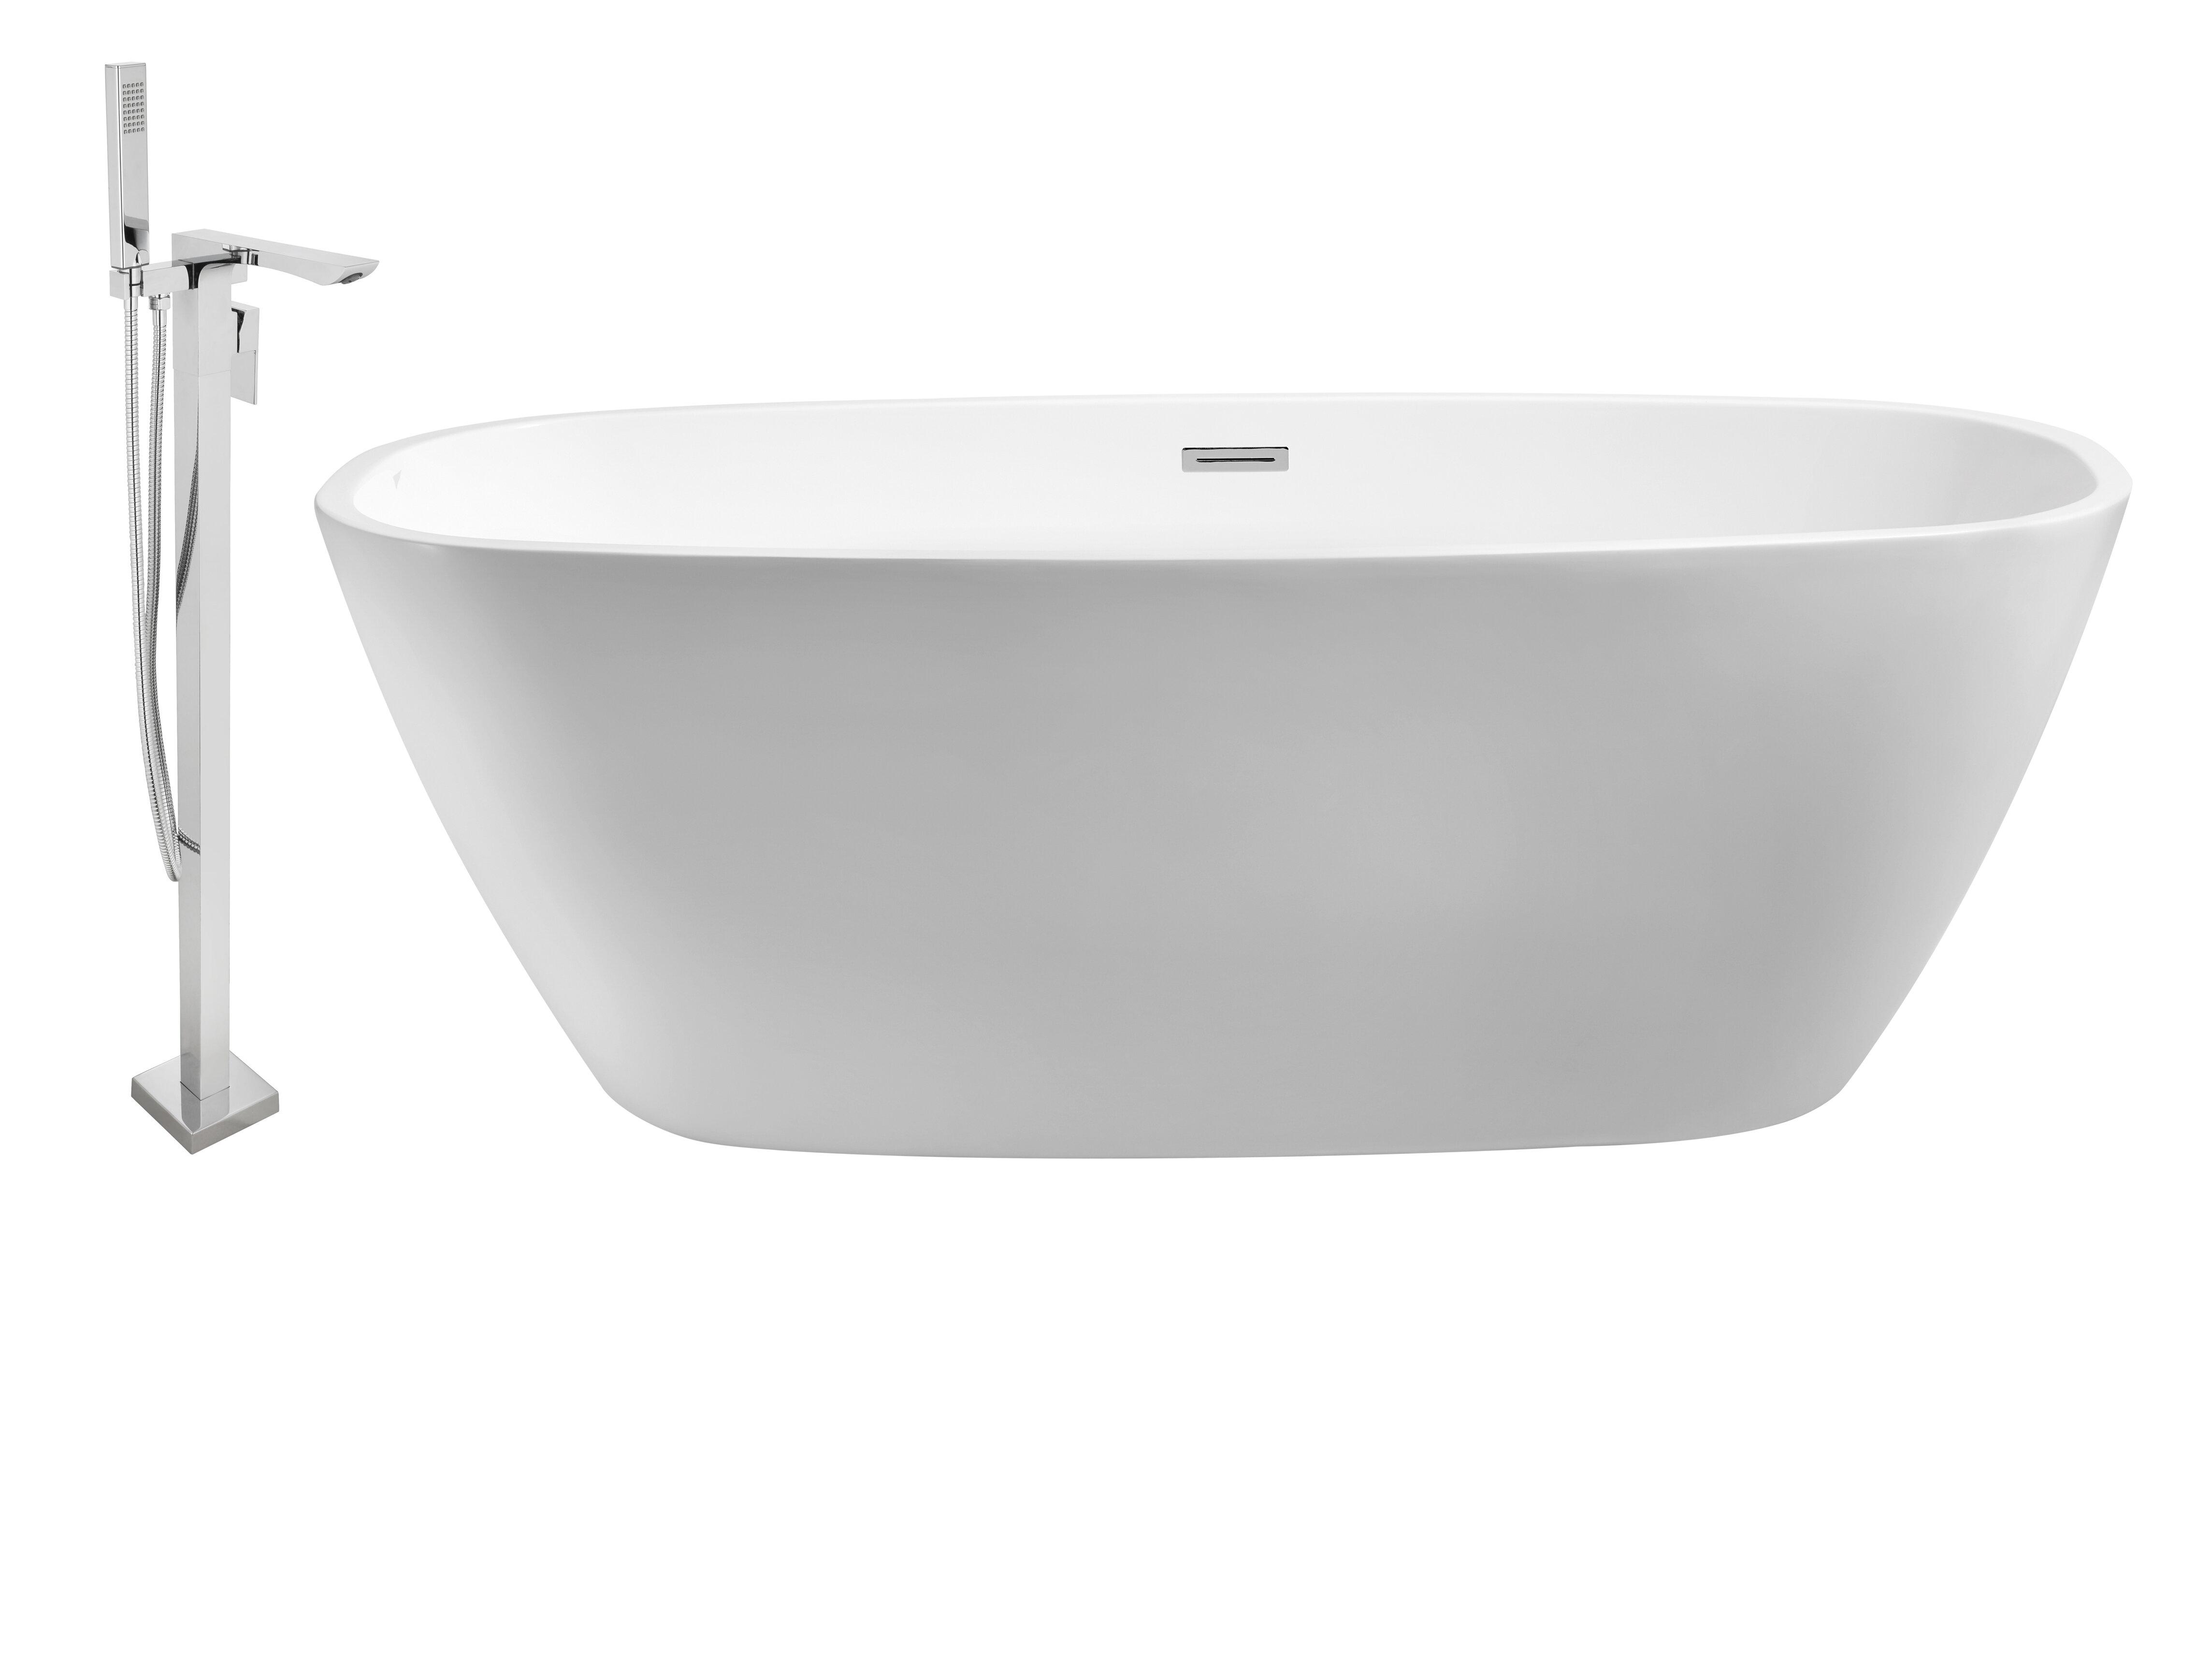 xl view photos video customers usa materials body product model tub badeloft freestanding position bw bathtub